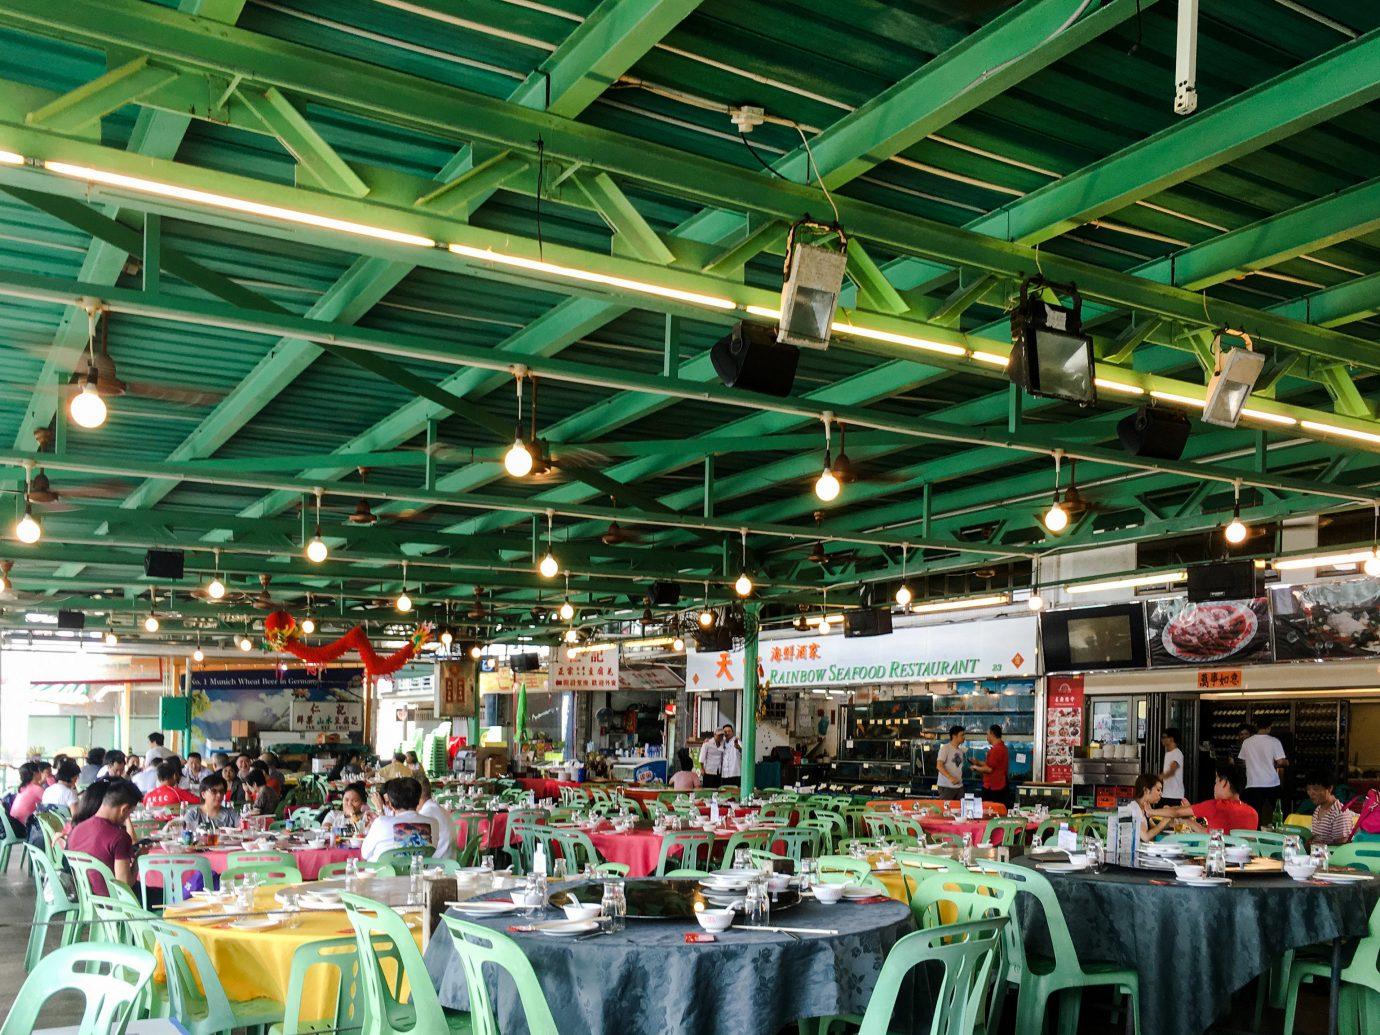 Trip Ideas indoor ceiling market marketplace function hall City leisure restaurant